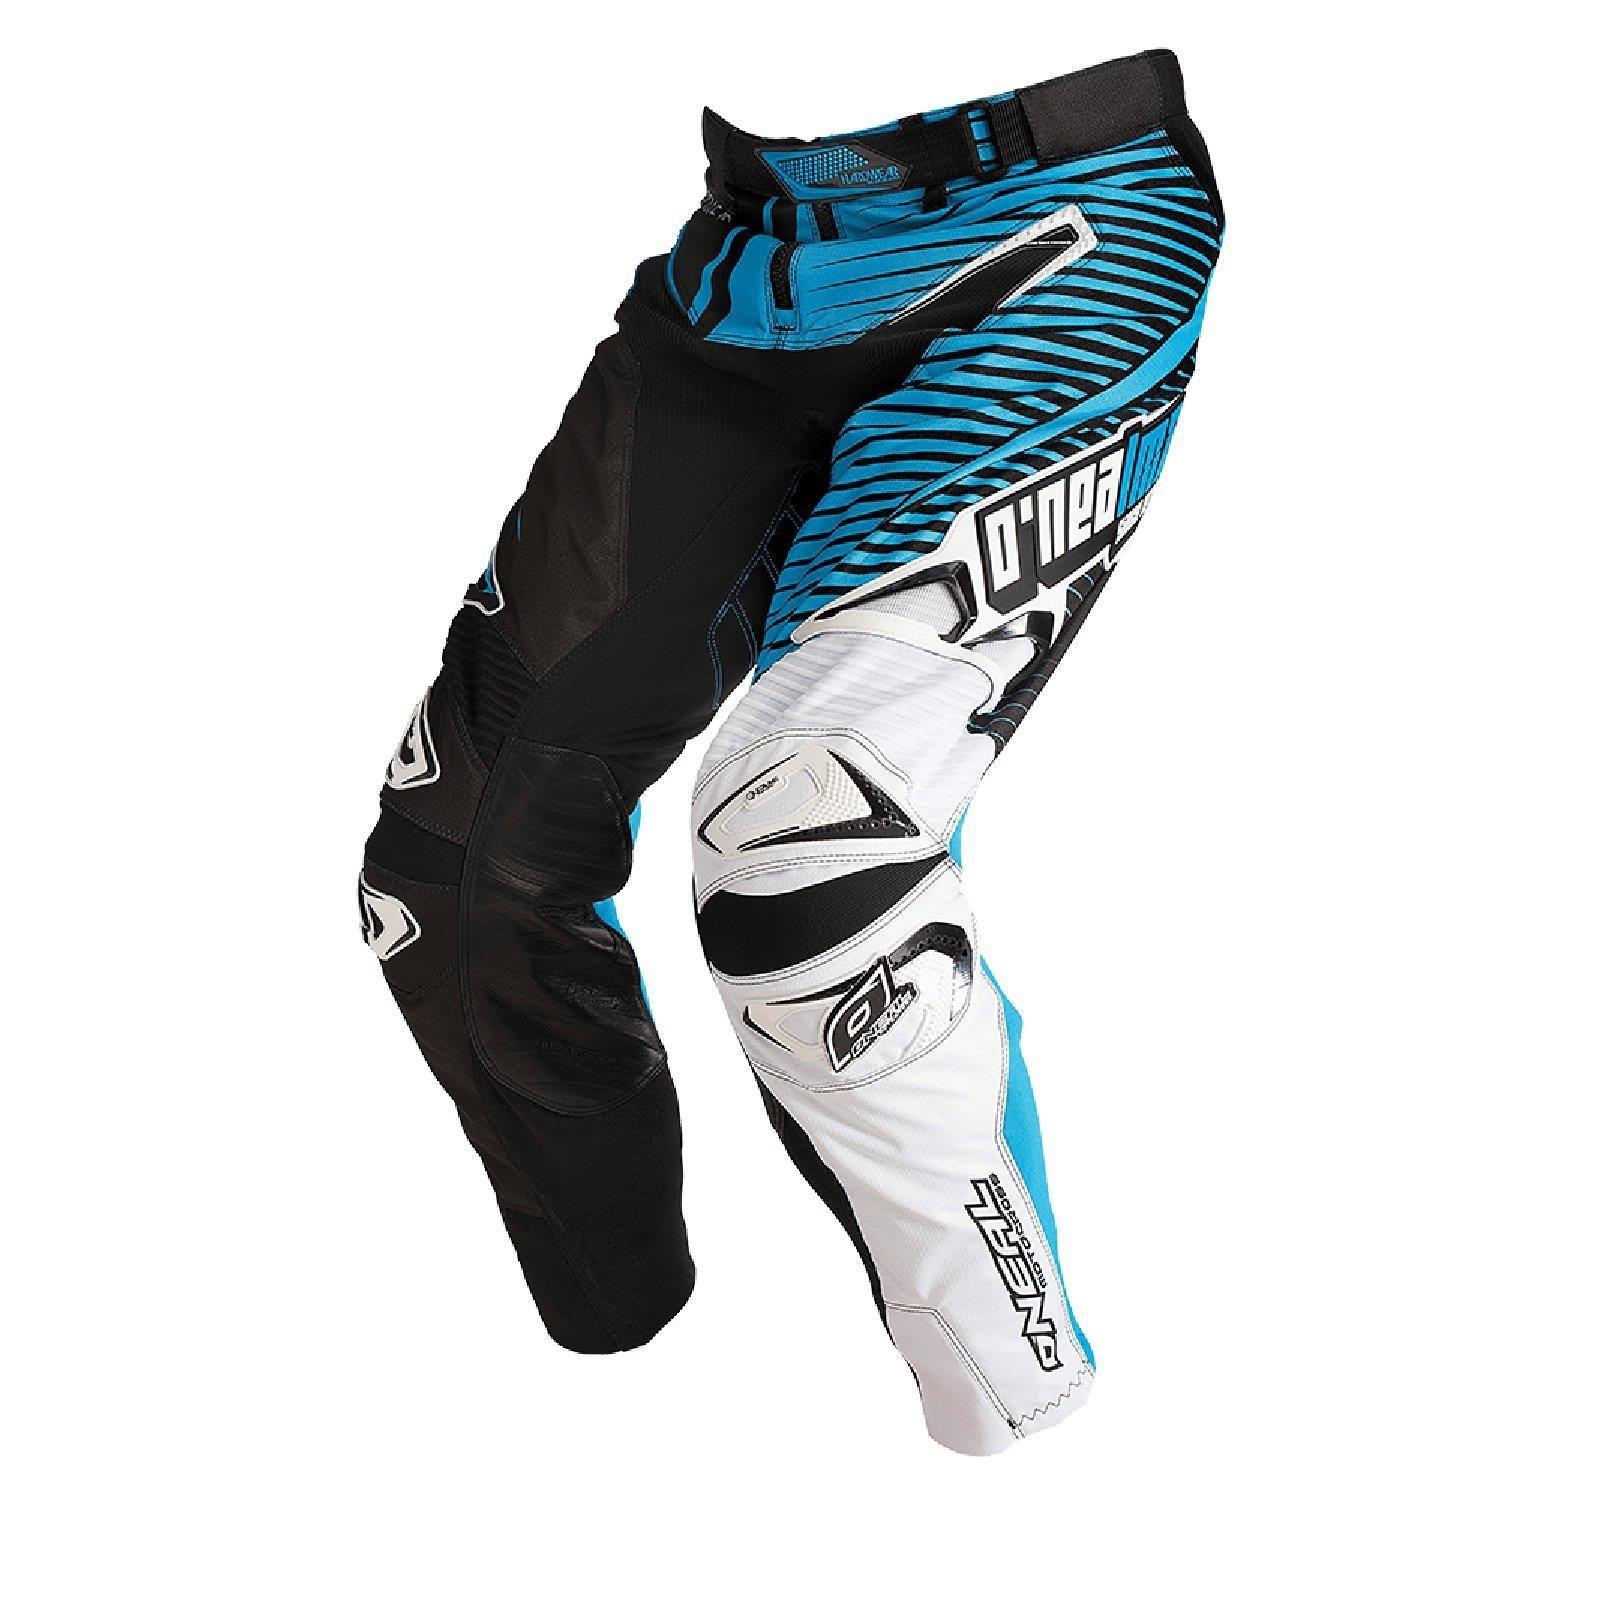 O-039-neal-elemento-Mayhem-Hardwear-Pants-pantalones-MX-Moto-Cross-Enduro-todoterreno-cuero miniatura 25